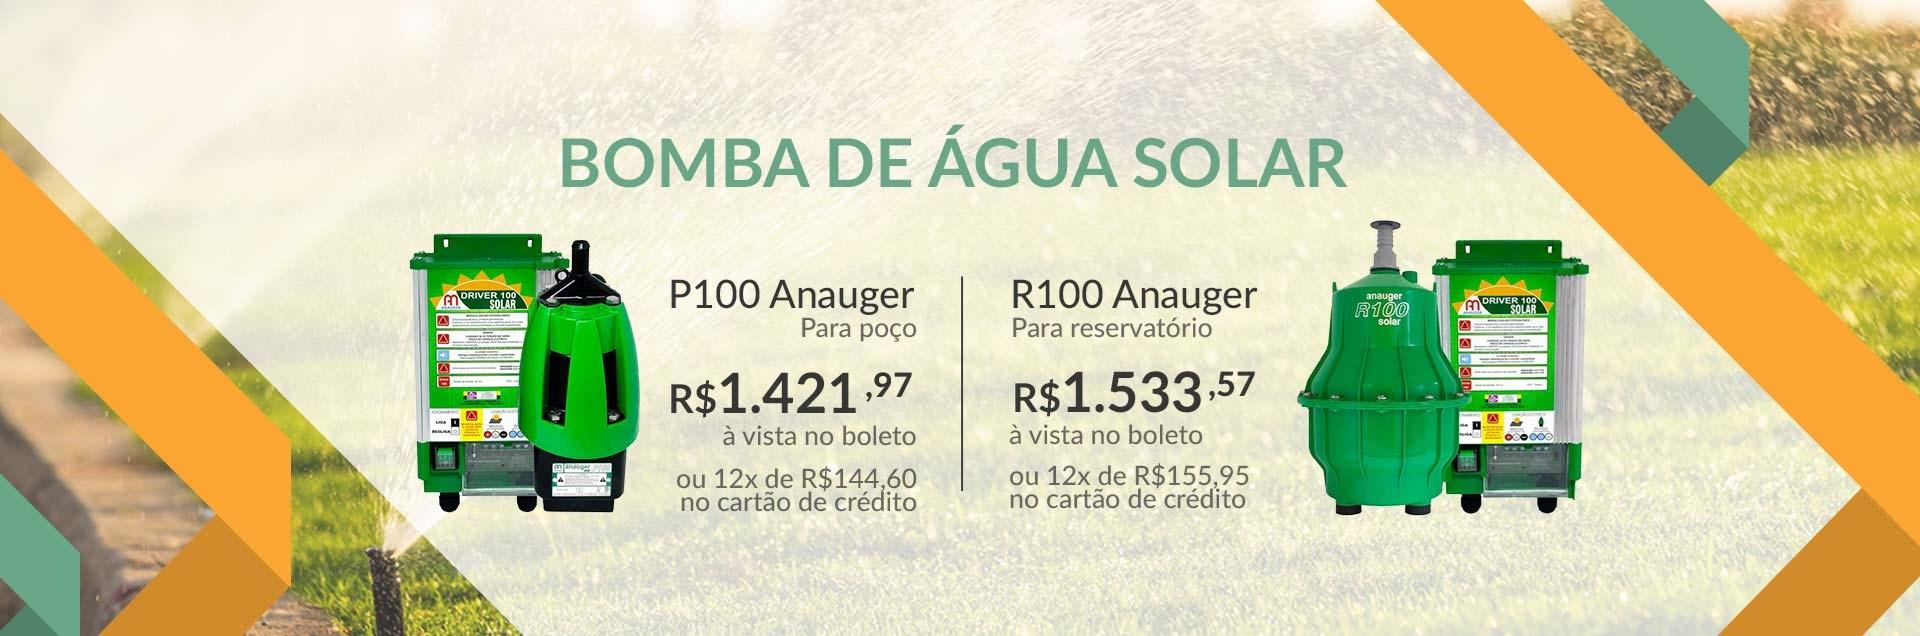 Bomba Solar P100 e R100 Anauger